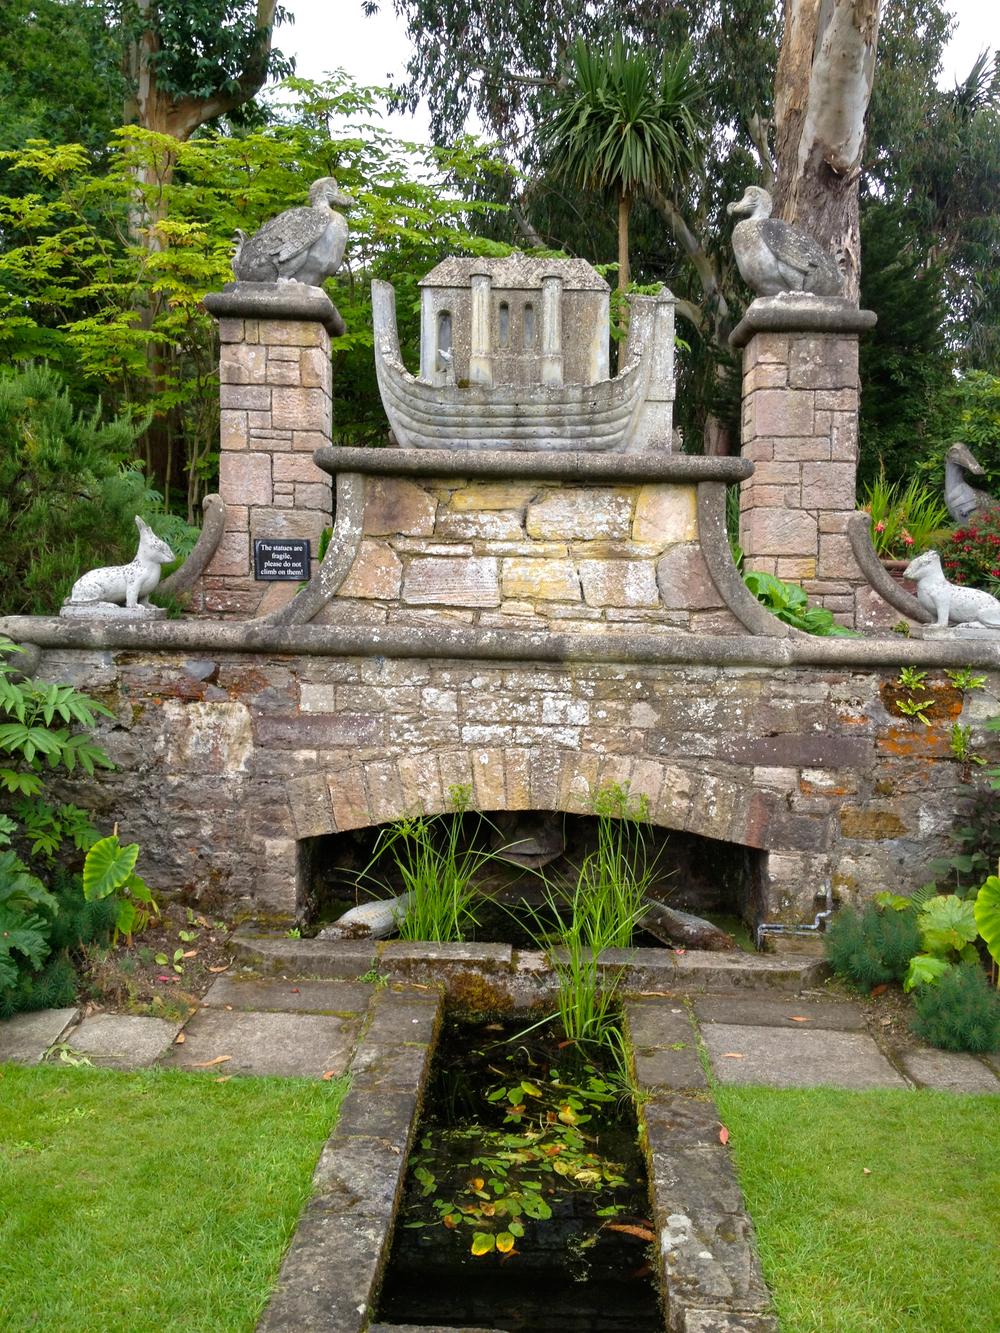 Noah's Ark Fountain at Mount Stewart Estate, Northern Ireland